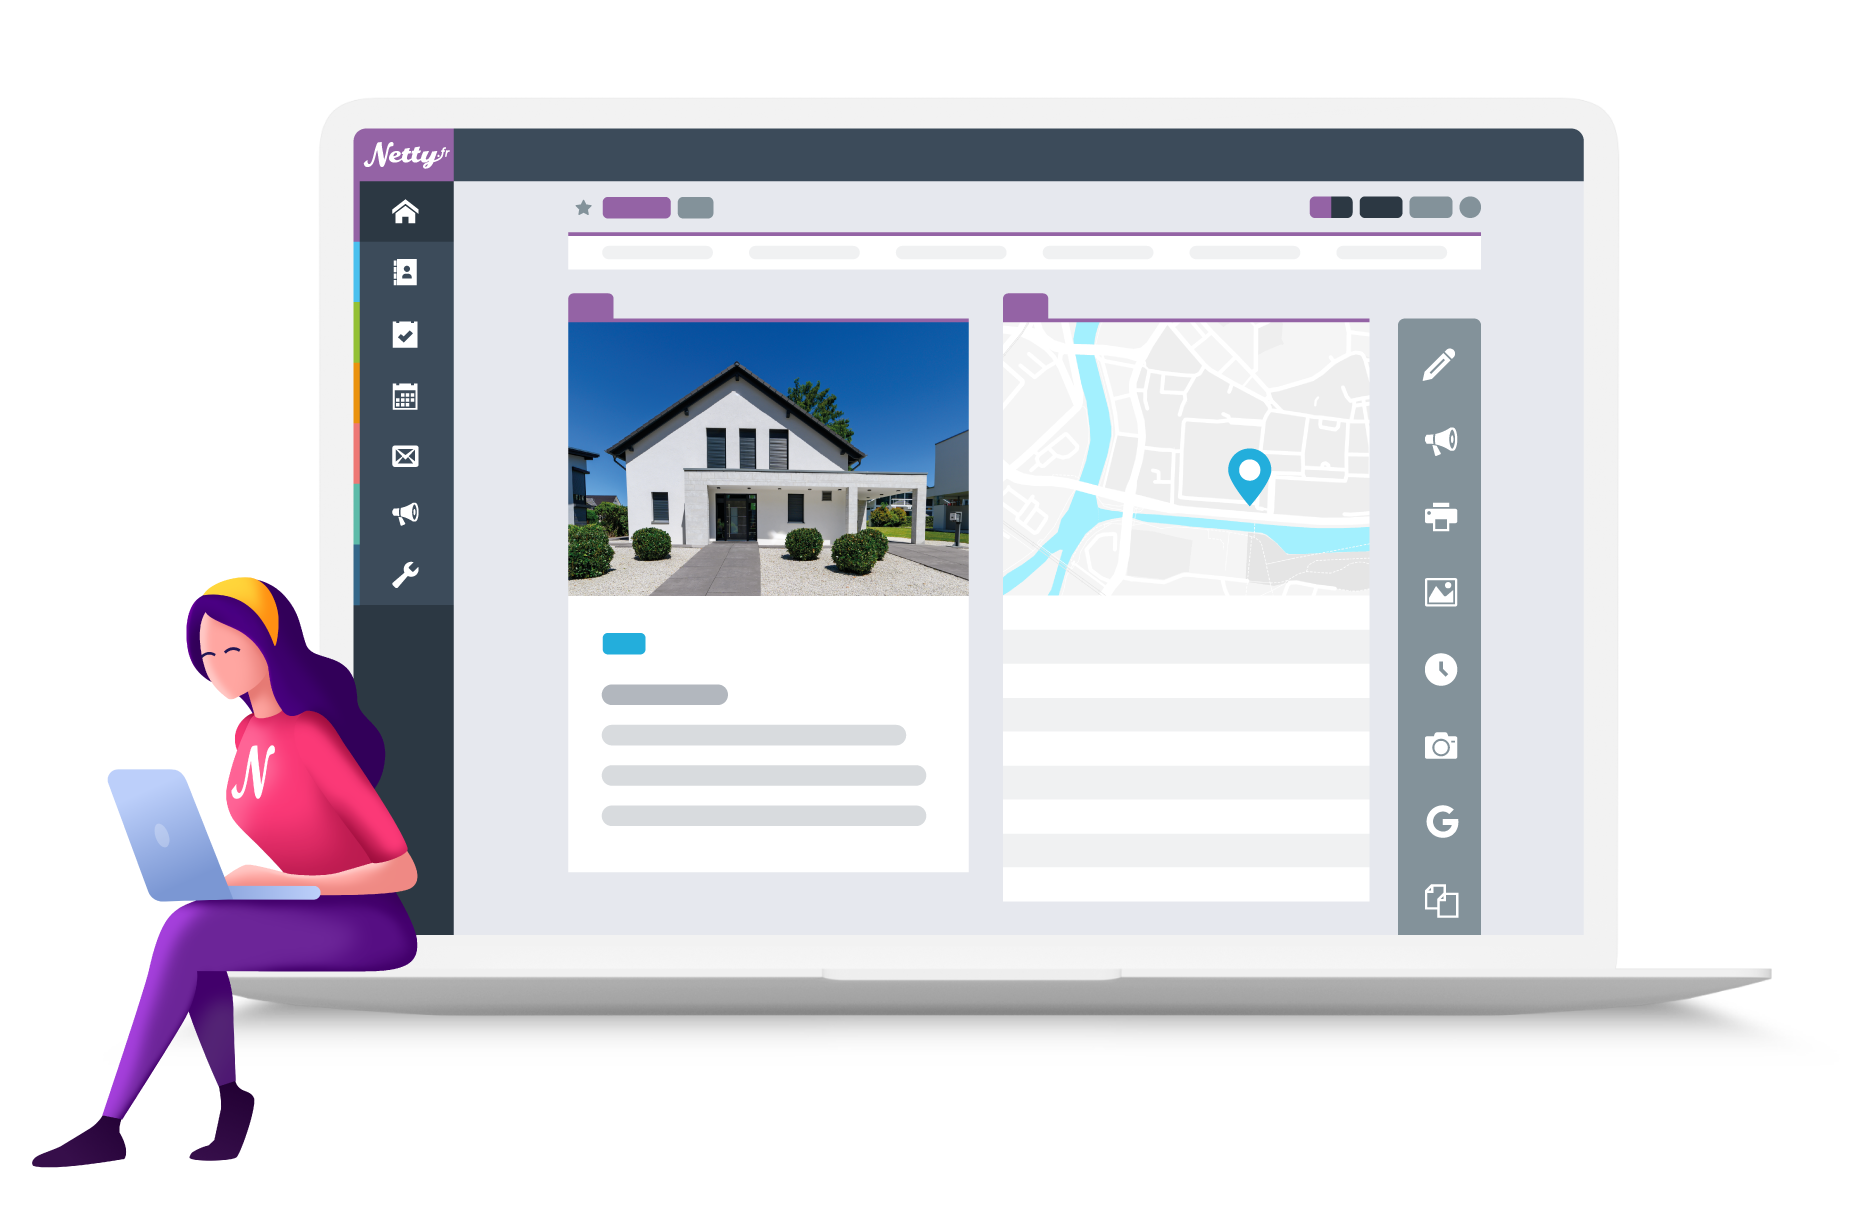 Illustration logiciel immobilier Netty